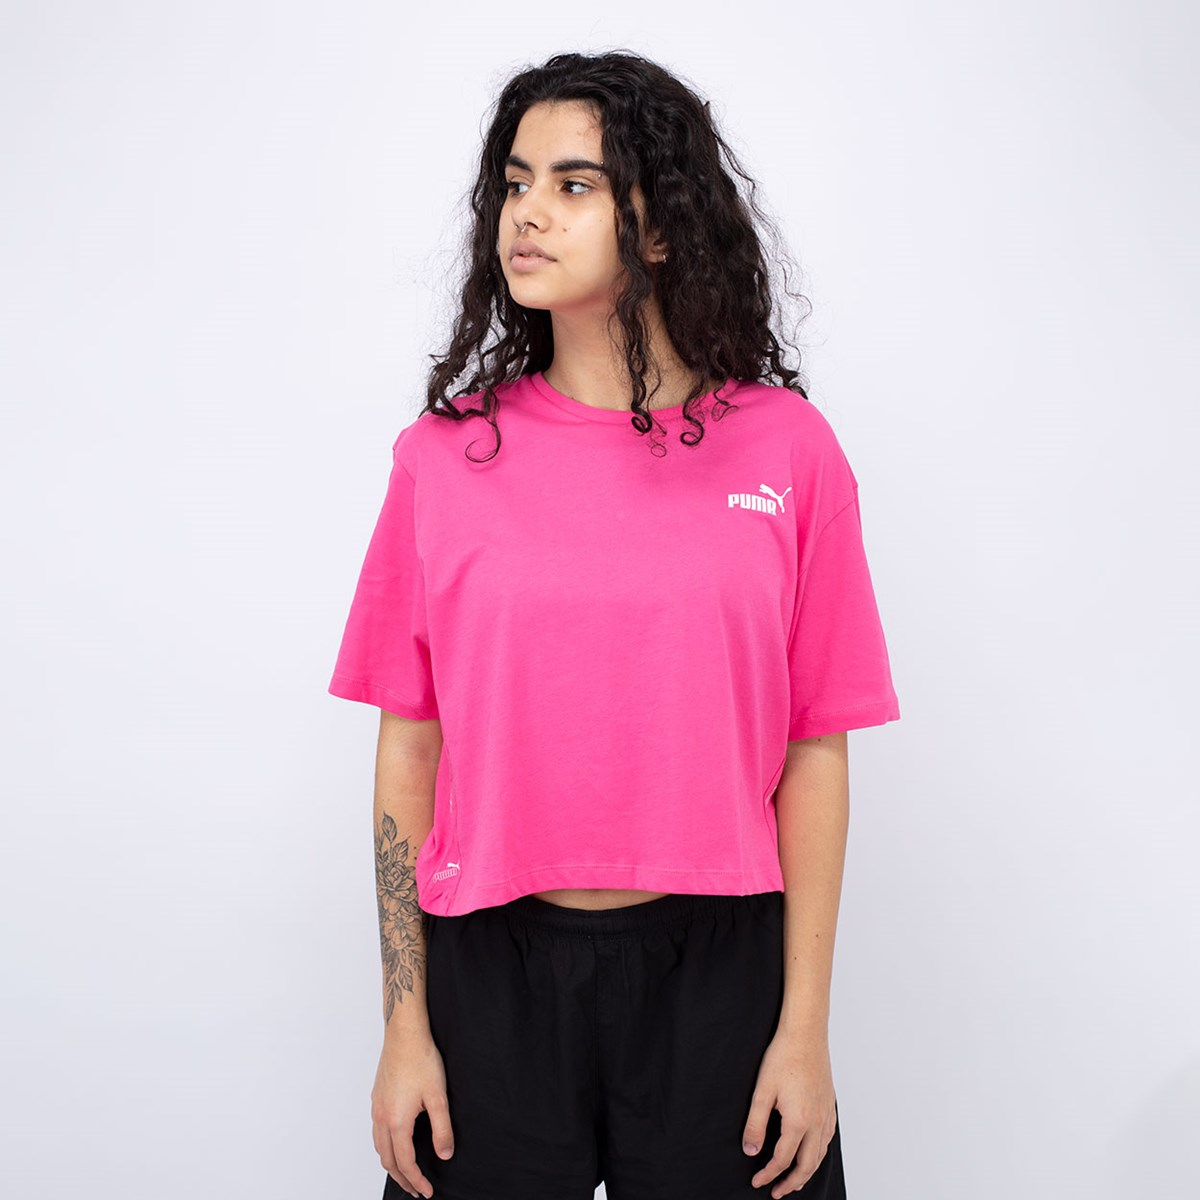 Camiseta Puma Amplified Glowing Pink 583609-25